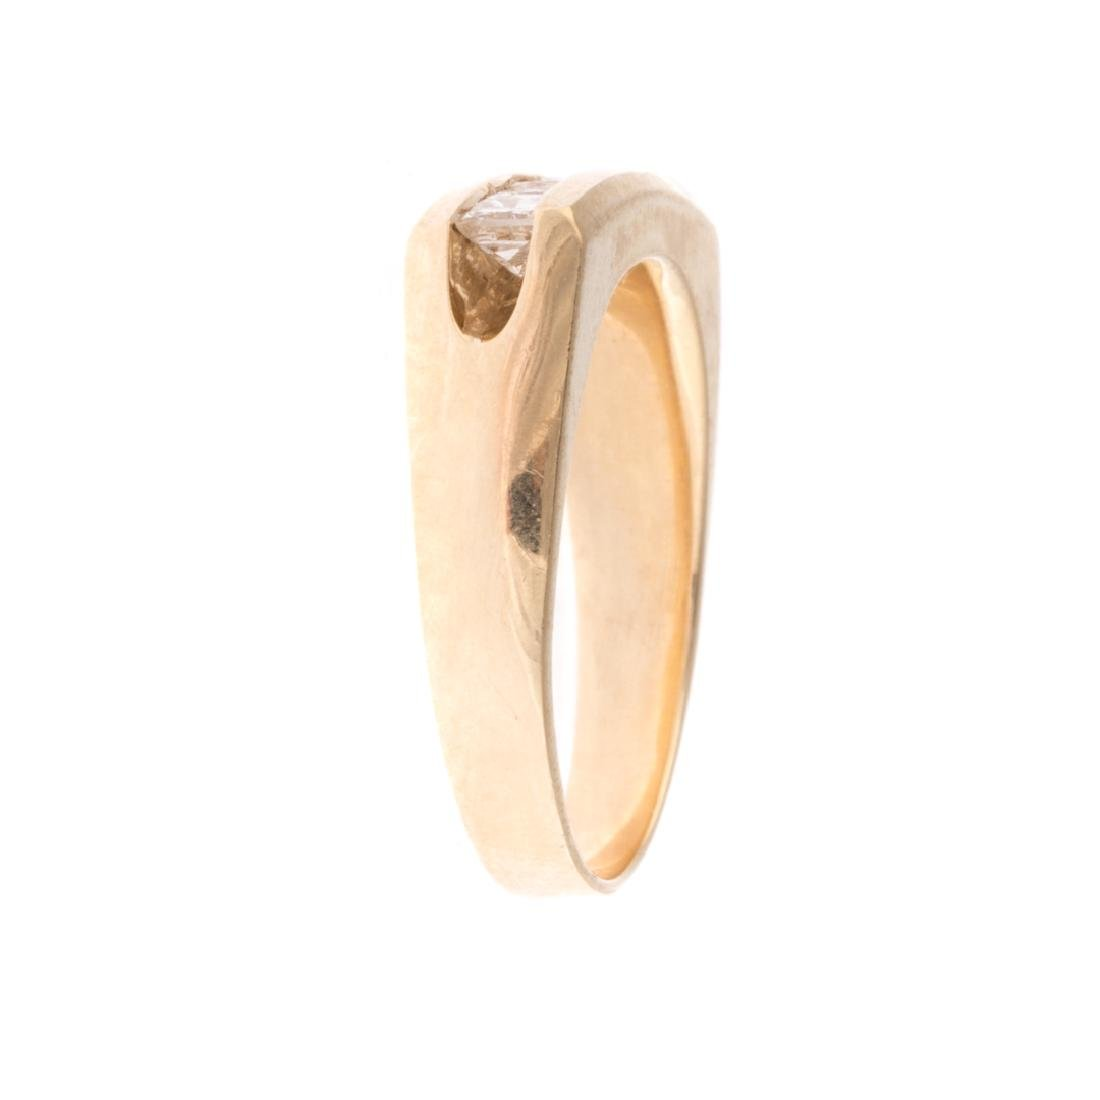 A Gentleman's Contemporary Diamond Ring - 2